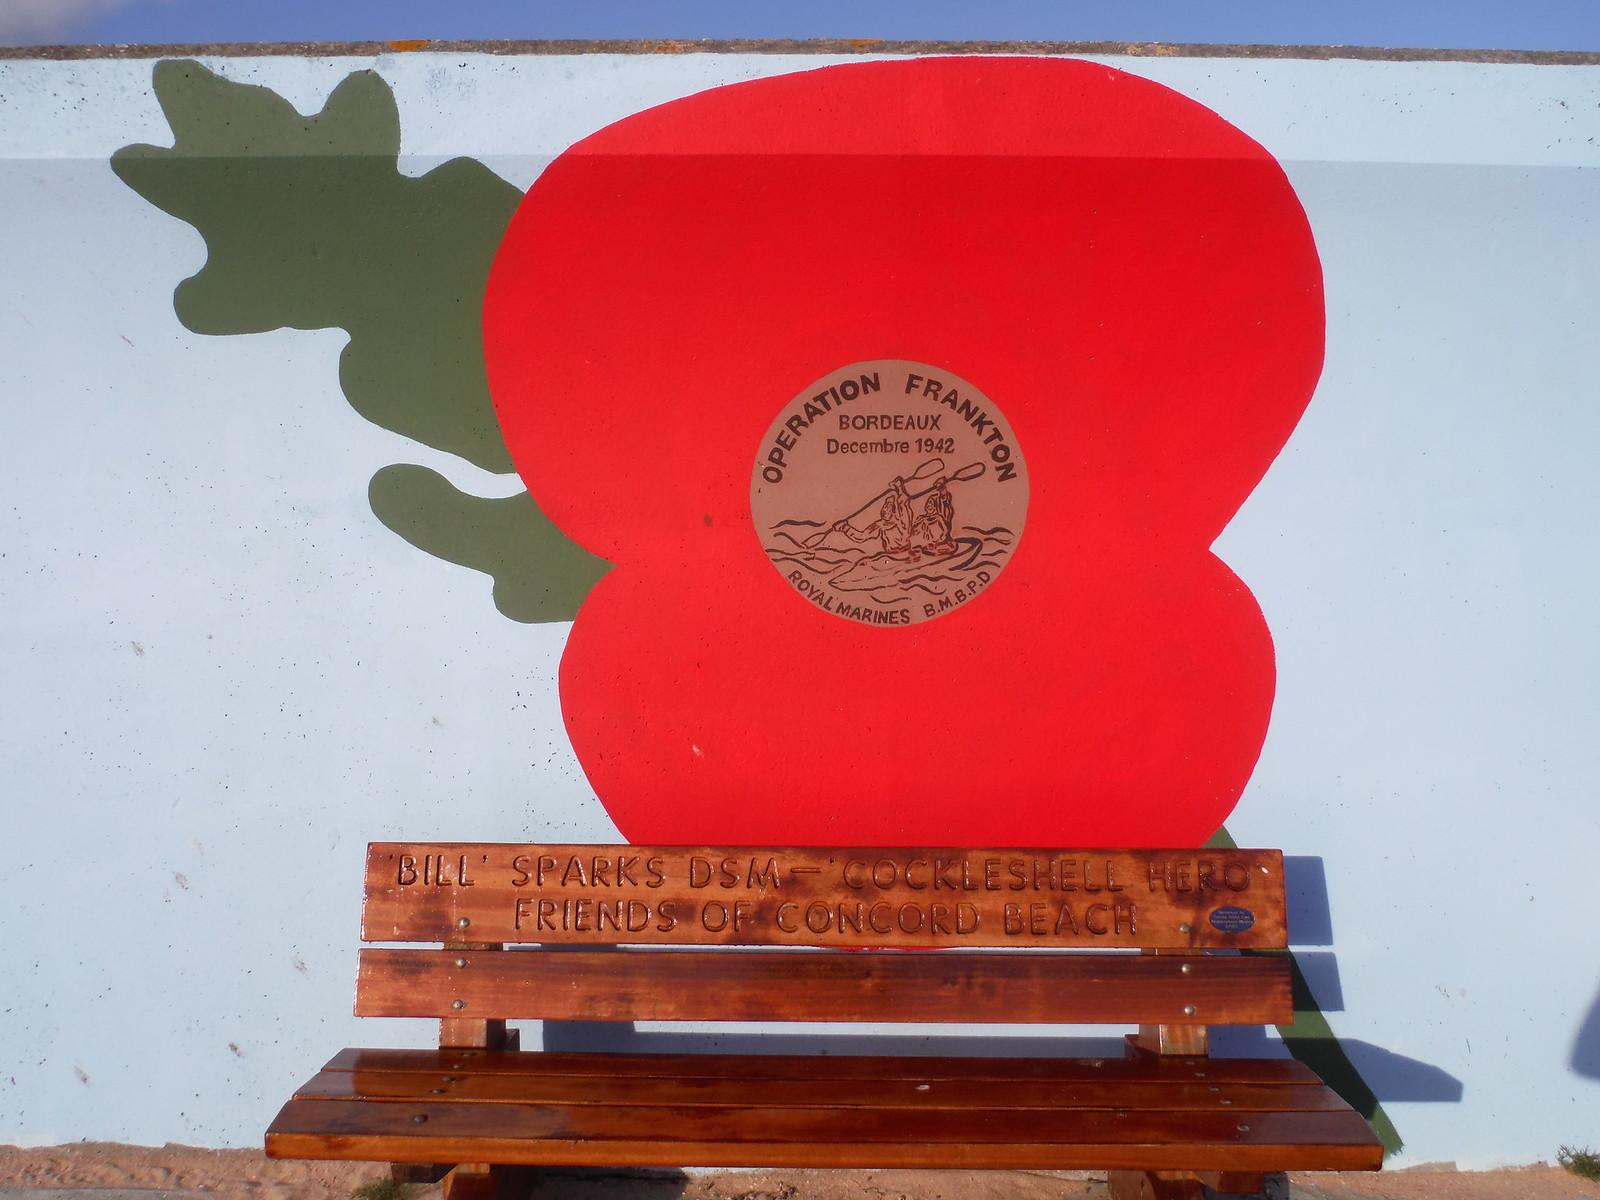 Royal Marines Dec 42 mural, Concord Beach, Canvey Island SWC Walk 258 Benfleet Circular (via Canvey Island)